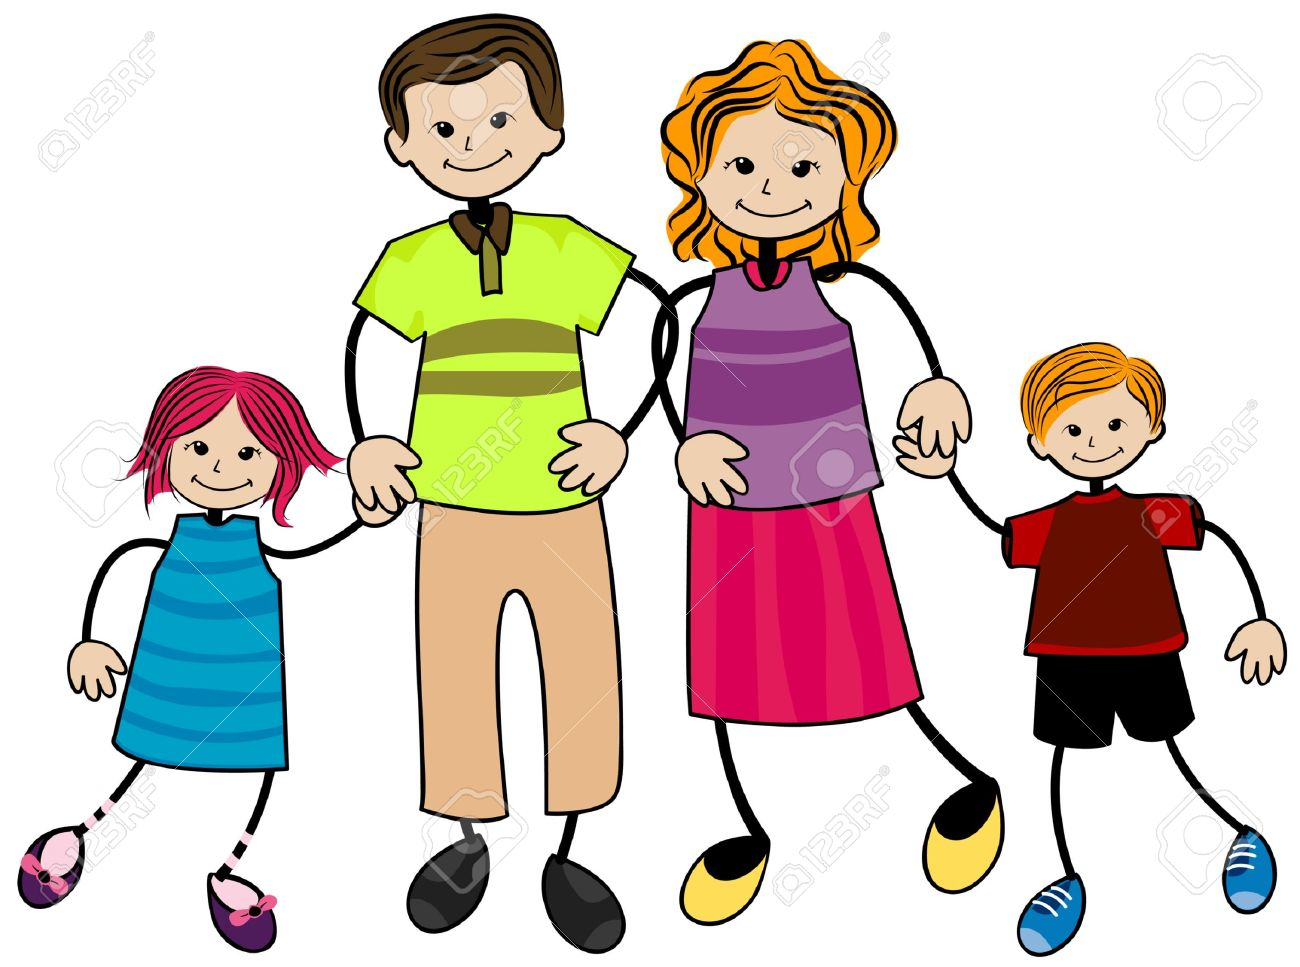 family clipart-family clipart-9